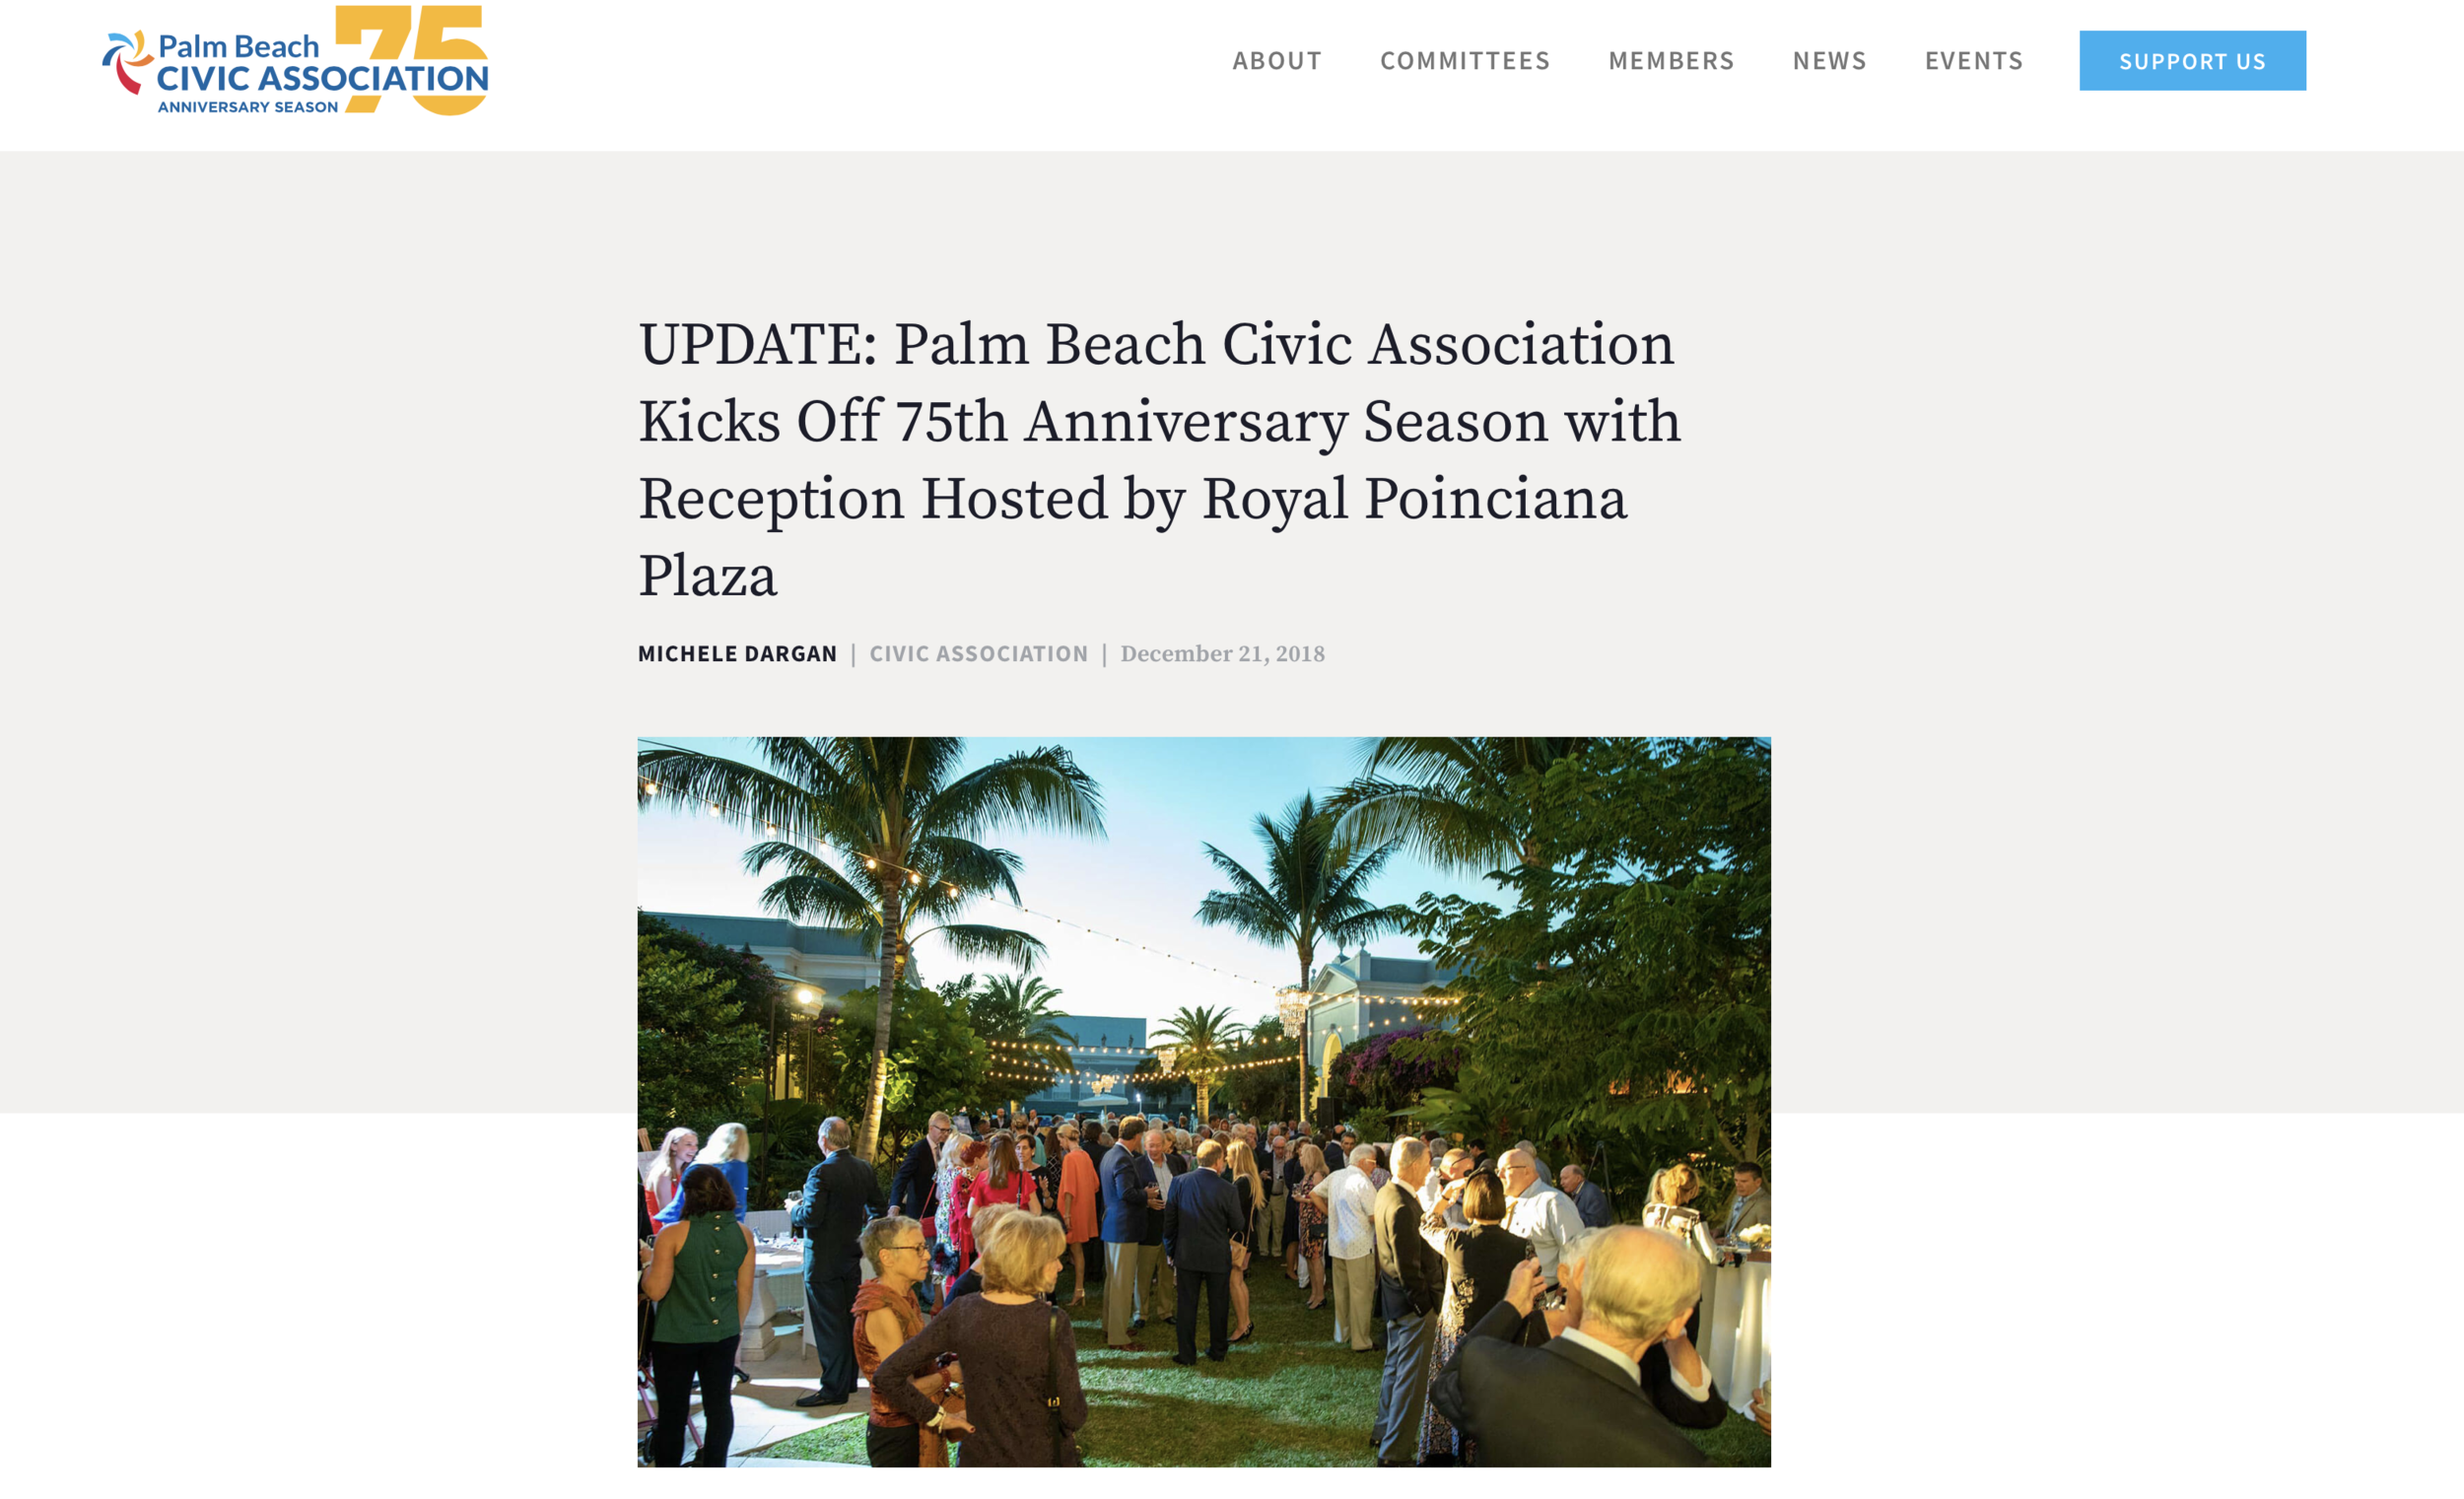 https://palmbeachcivic.org/palm-beach-civic-association-kicks-off-75th-anniversary-season-with-reception-hosted-by-royal-poinciana-plaza/